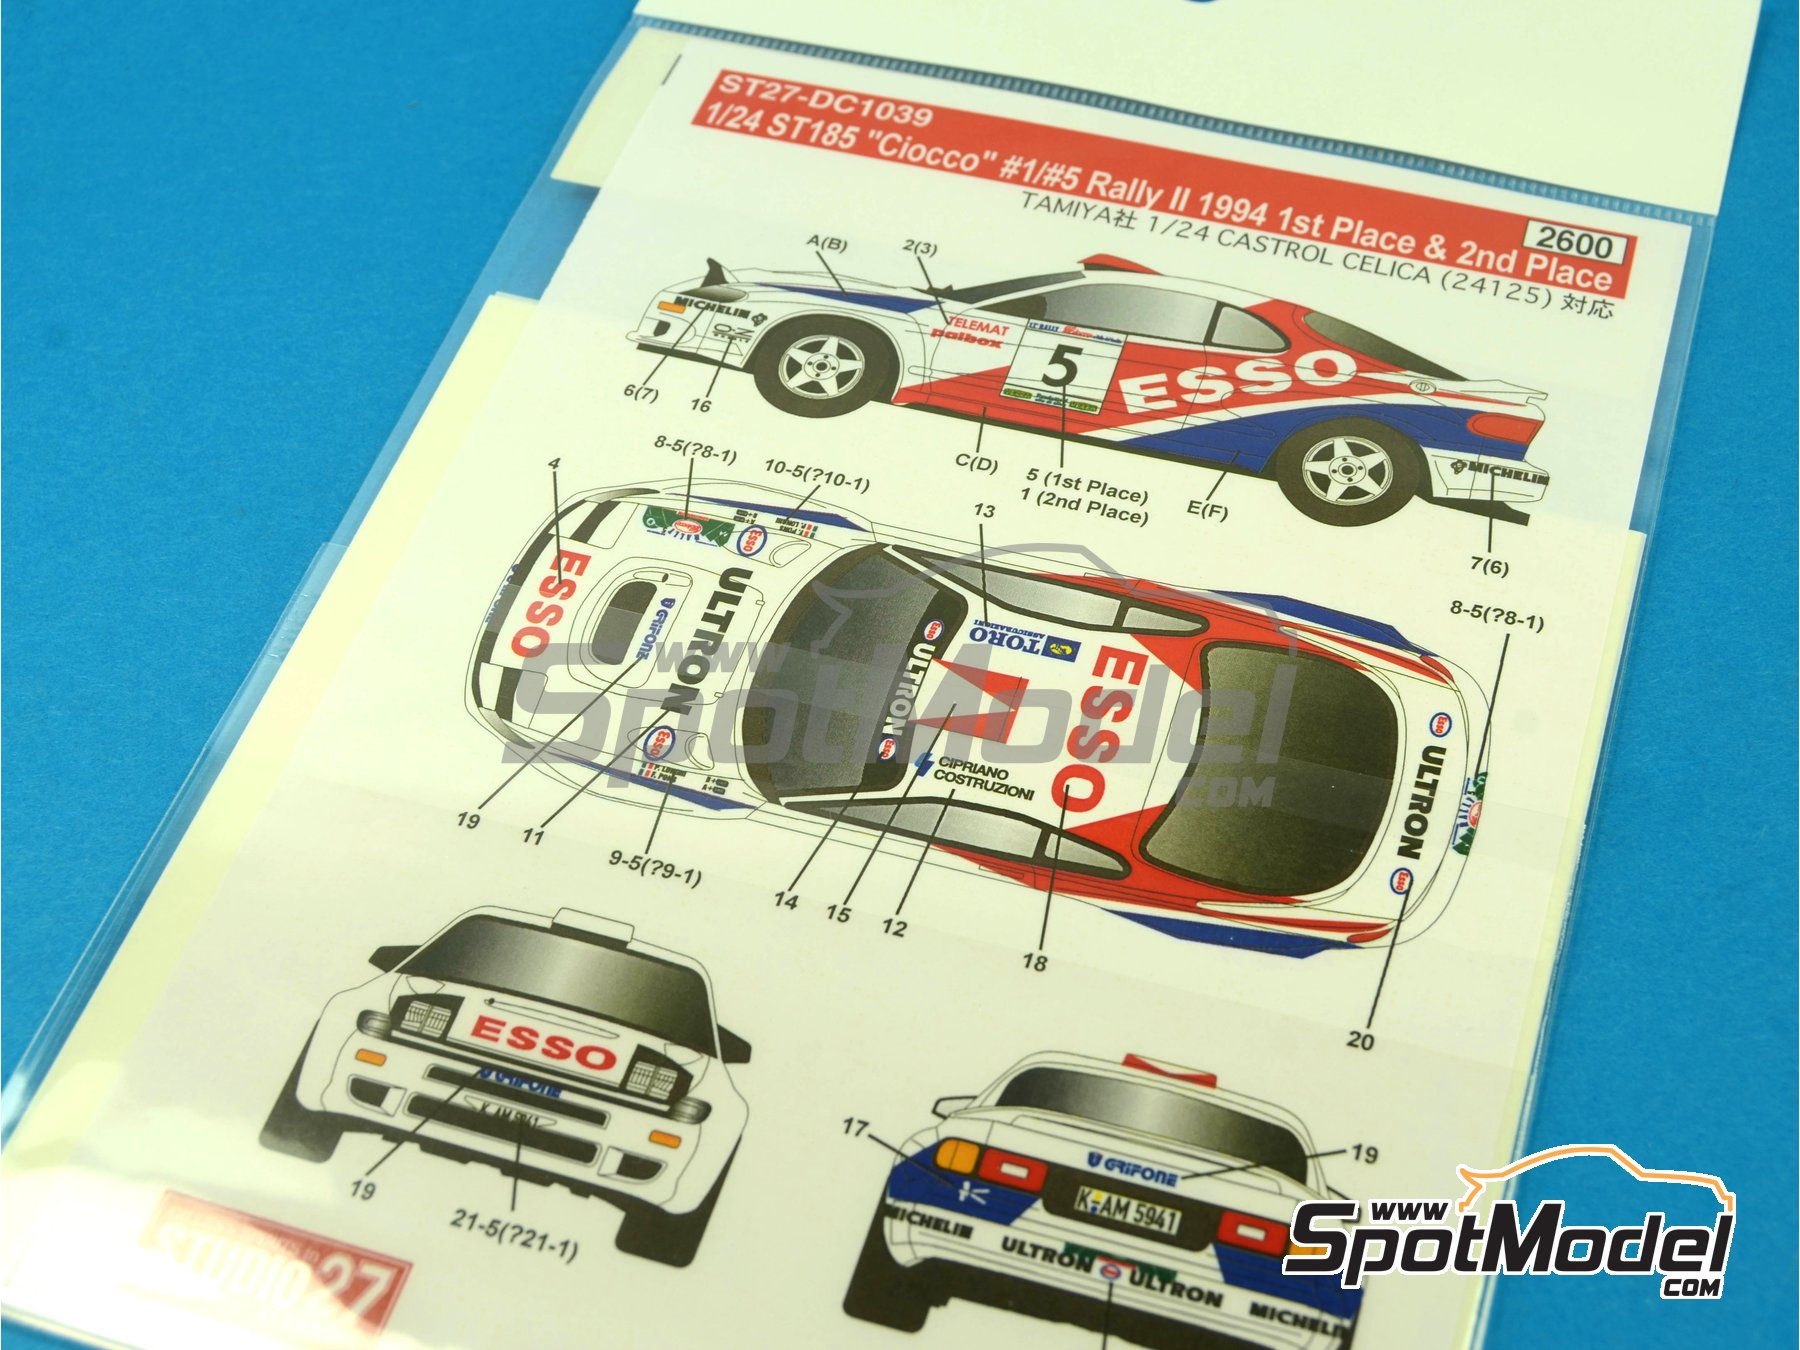 Image 1: Toyota Celica GT-Four WRC Esso - Rally del Ciocco e Valle del Serchio 1994 | Calcas de agua en escala1/24 fabricado por Studio27 (ref.ST27-DC1039)